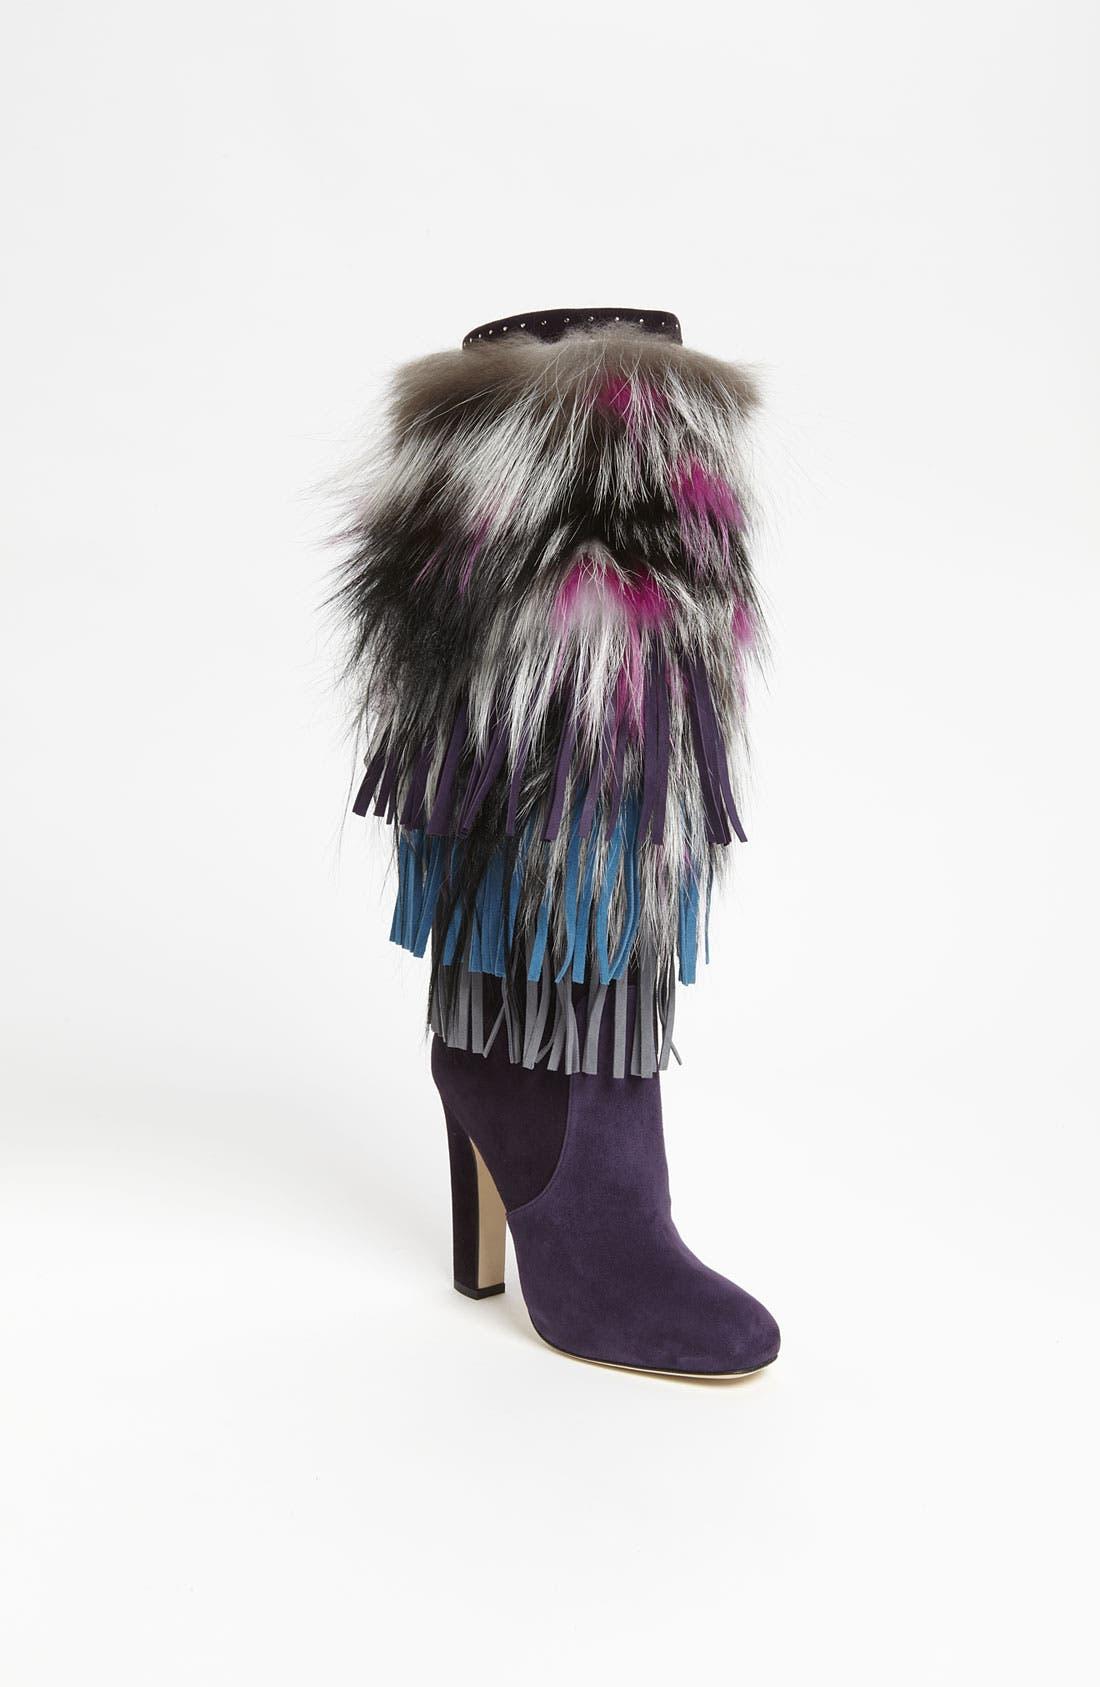 Alternate Image 1 Selected - Jimmy Choo 'Dalia' Tall Boot